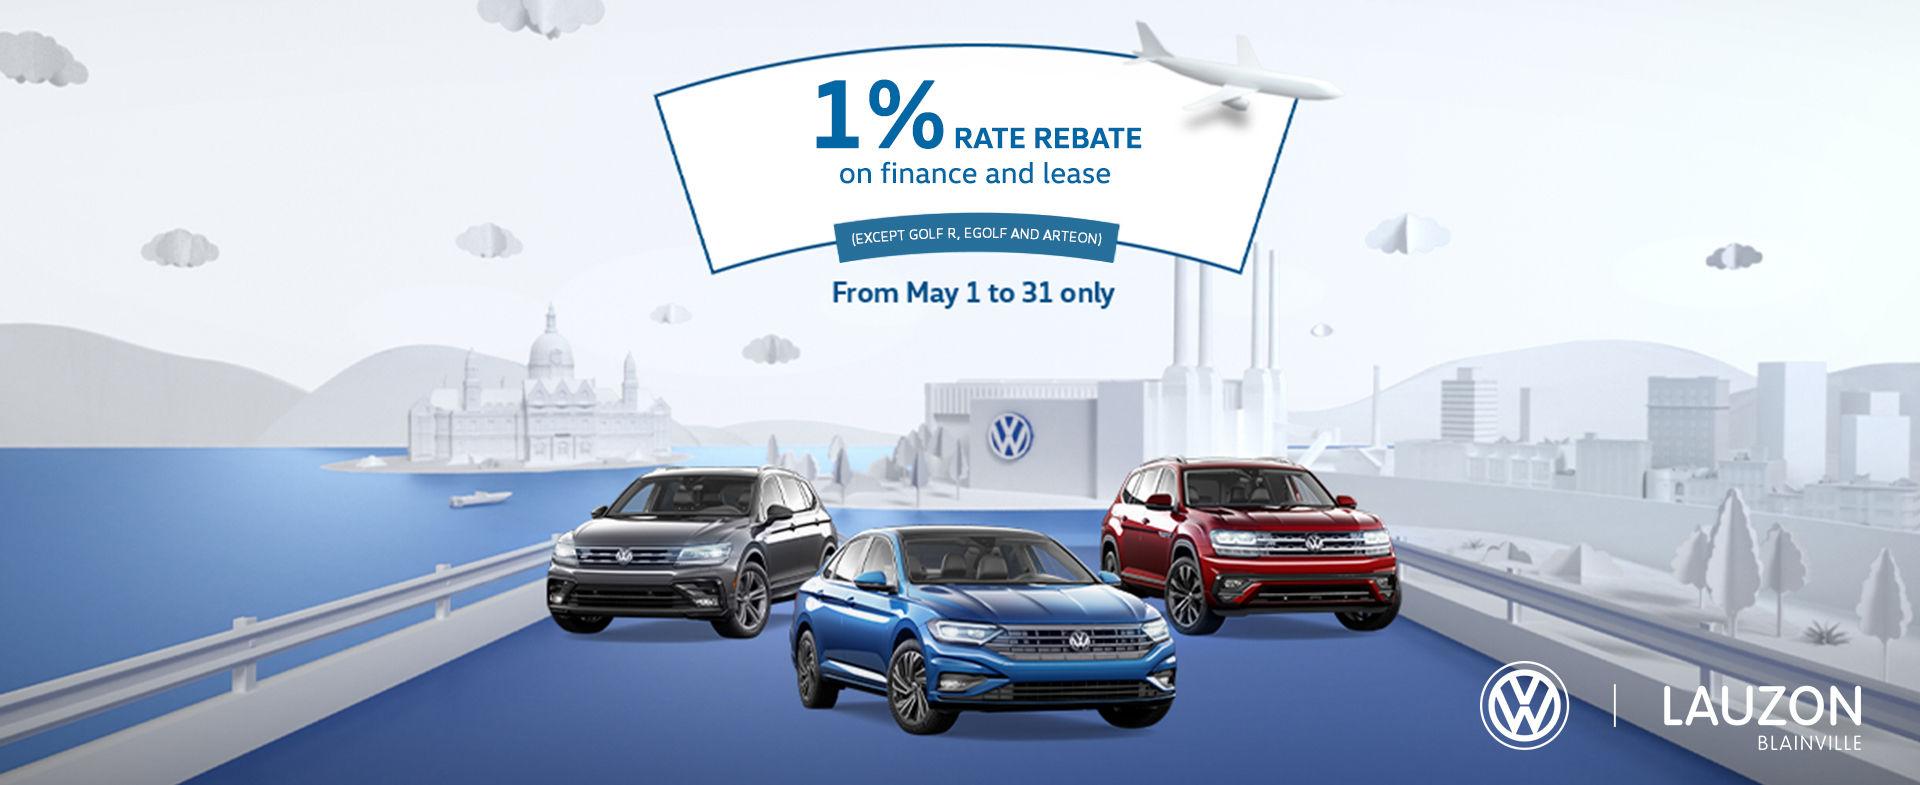 VW May promo mai 1% rebate